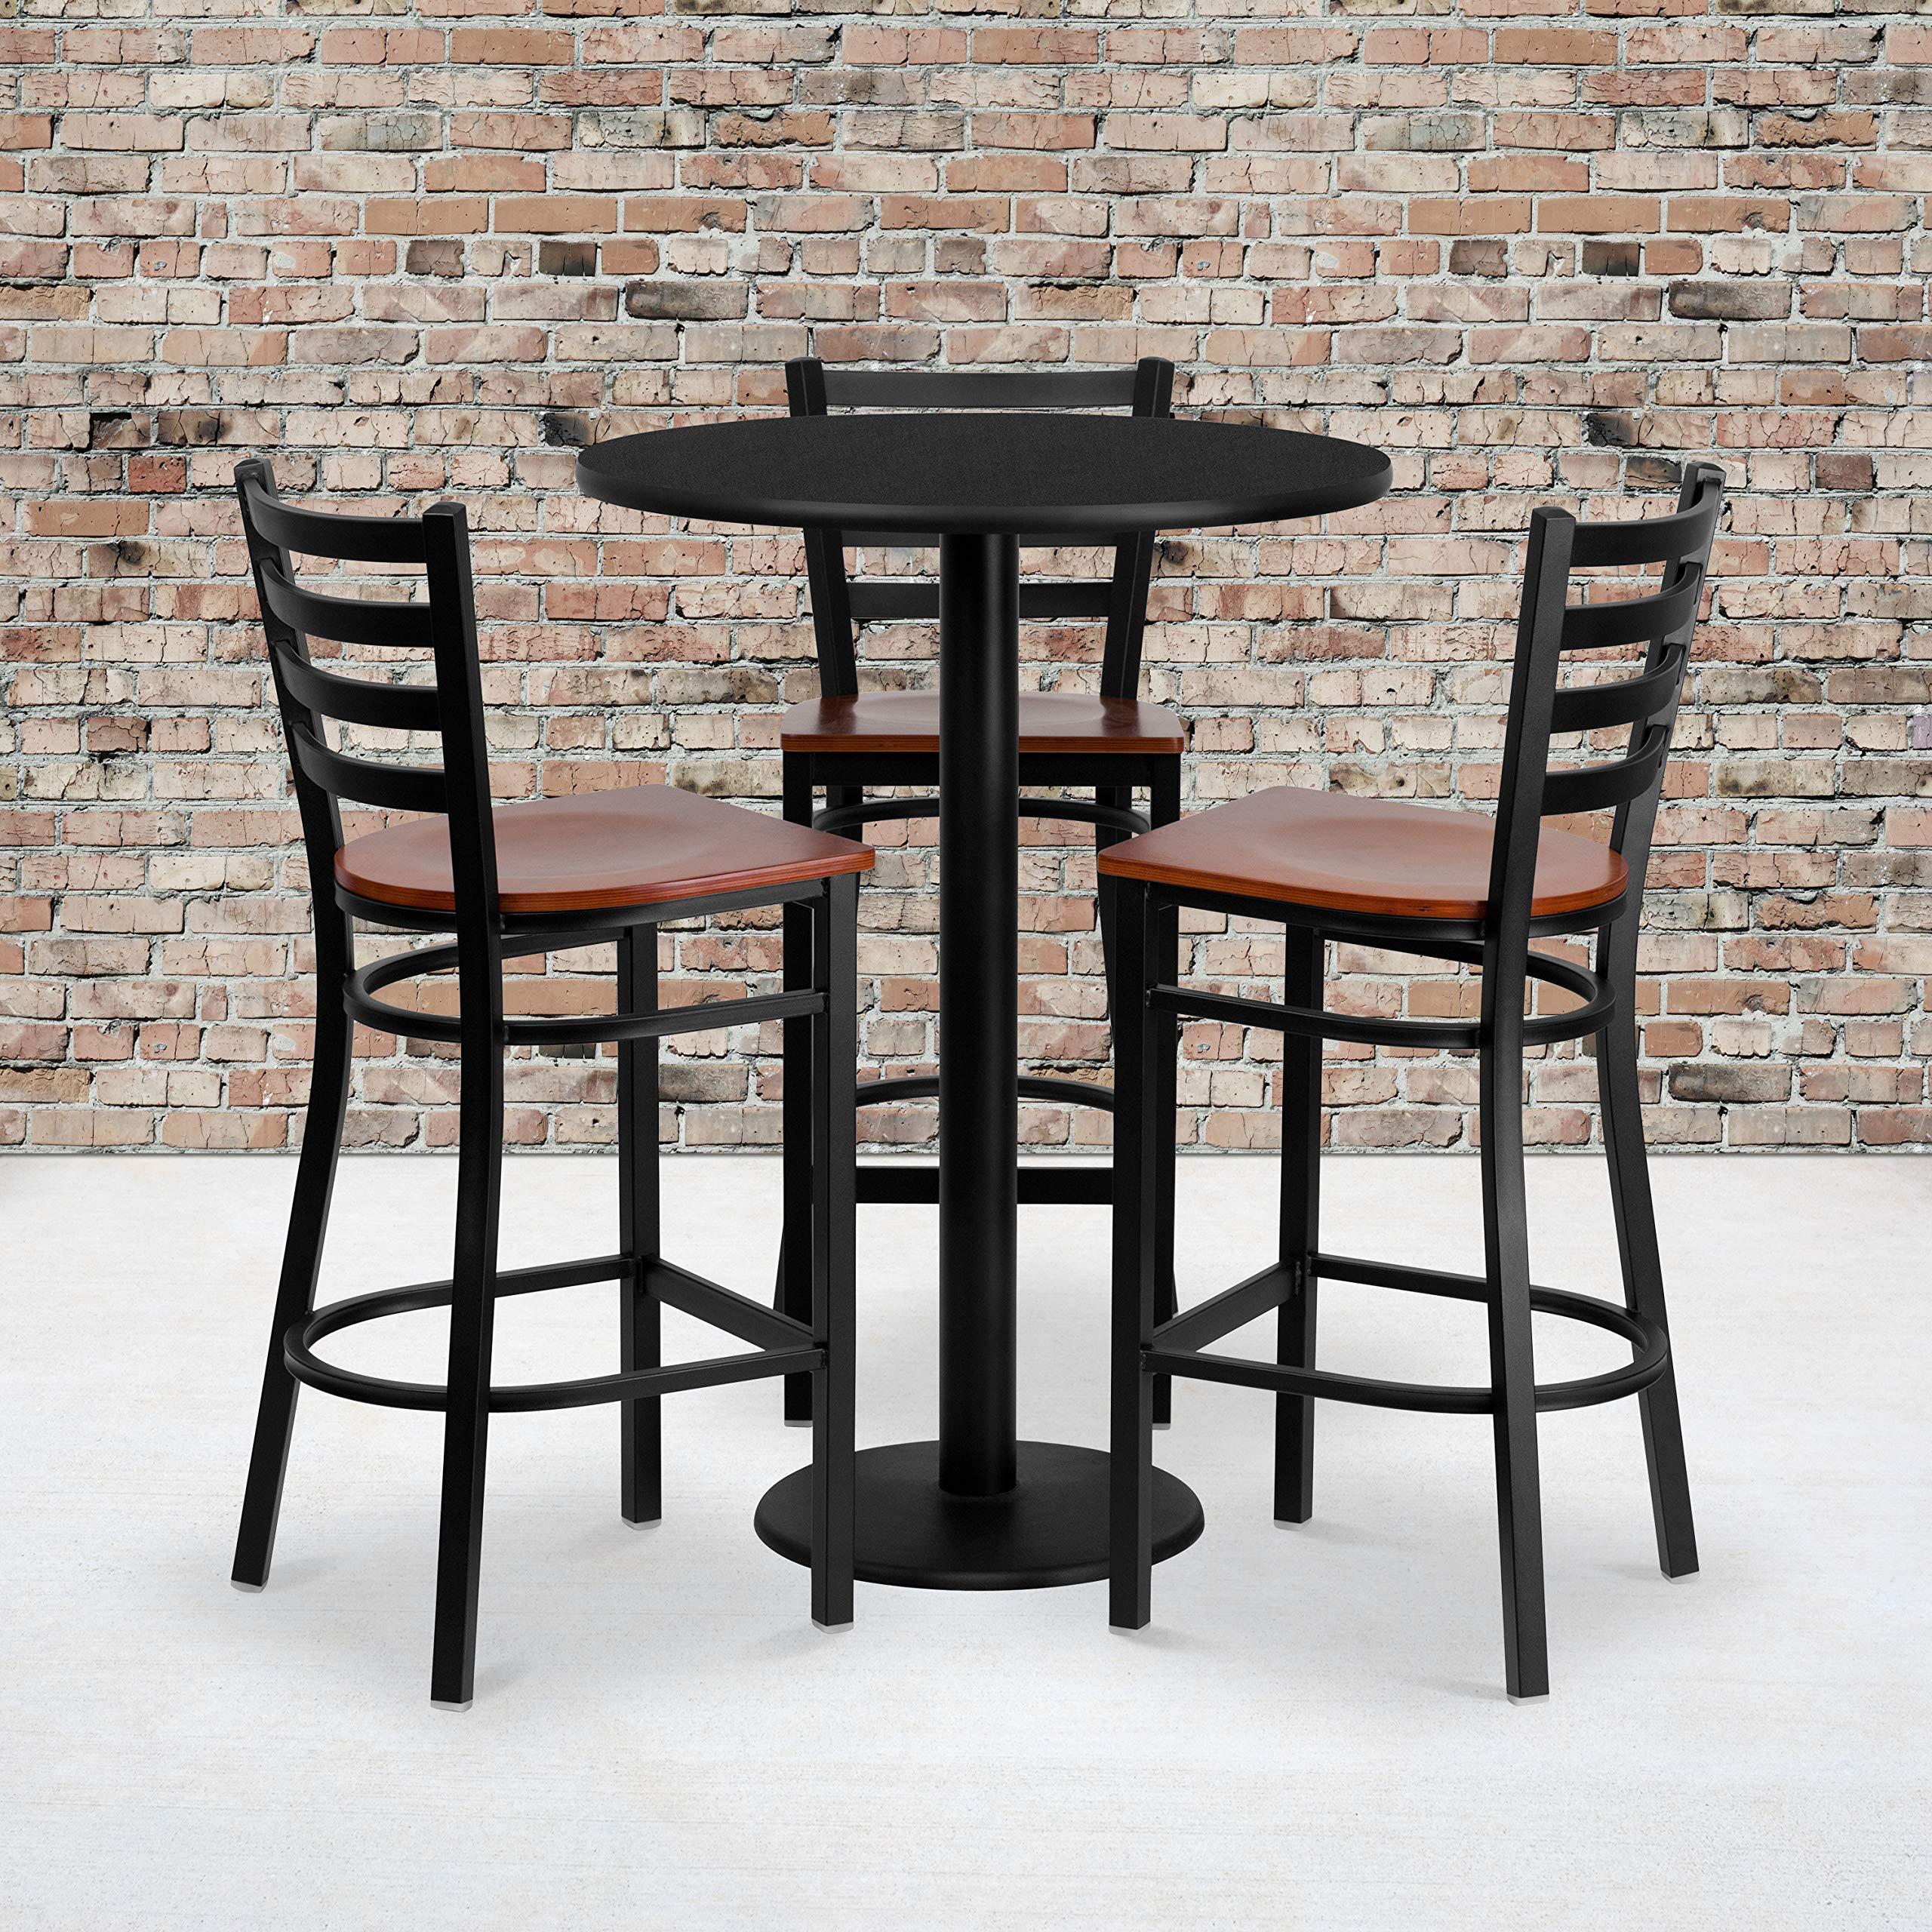 Flash Furniture 30'' Round Black Laminate Table Set with 3 Ladder Back Metal Barstools - Cherry Wood Seat by Flash Furniture